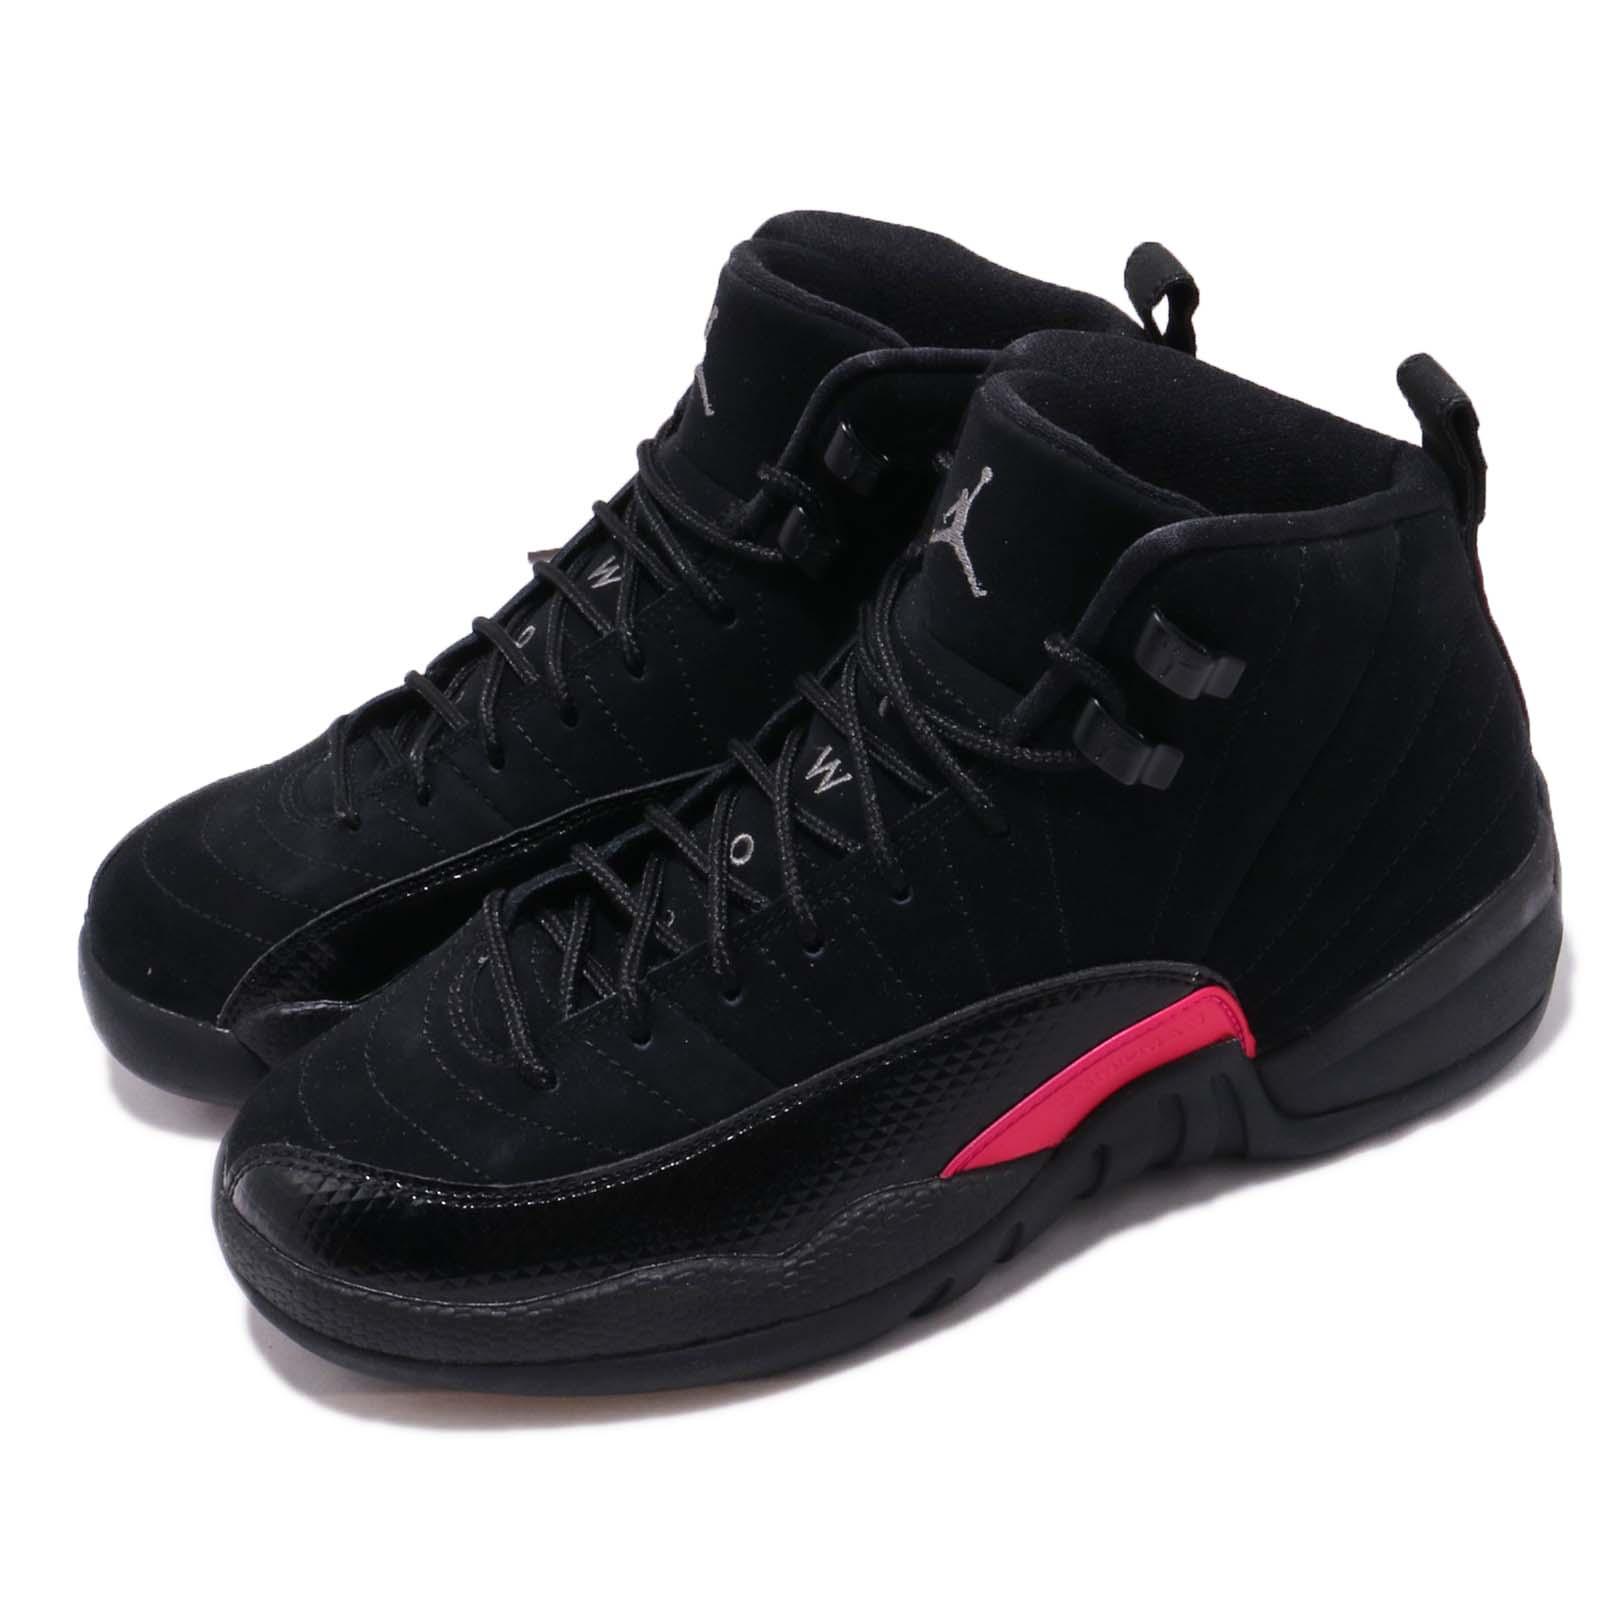 Nike 籃球鞋 Jordan 12 Retro 女鞋 510815-006